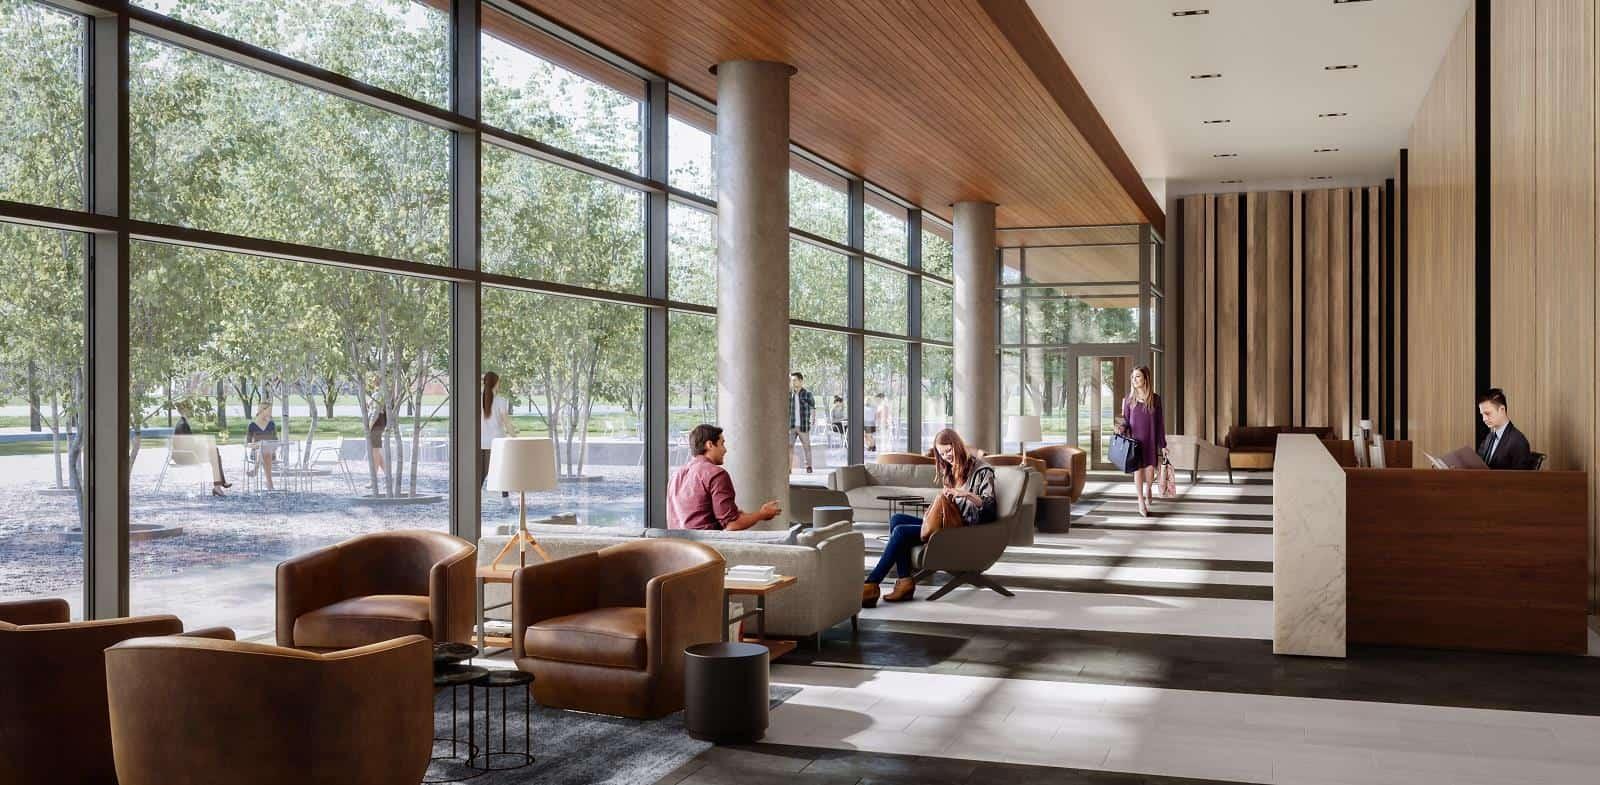 Home Condos at Power and Adelaide Lobby True Condos